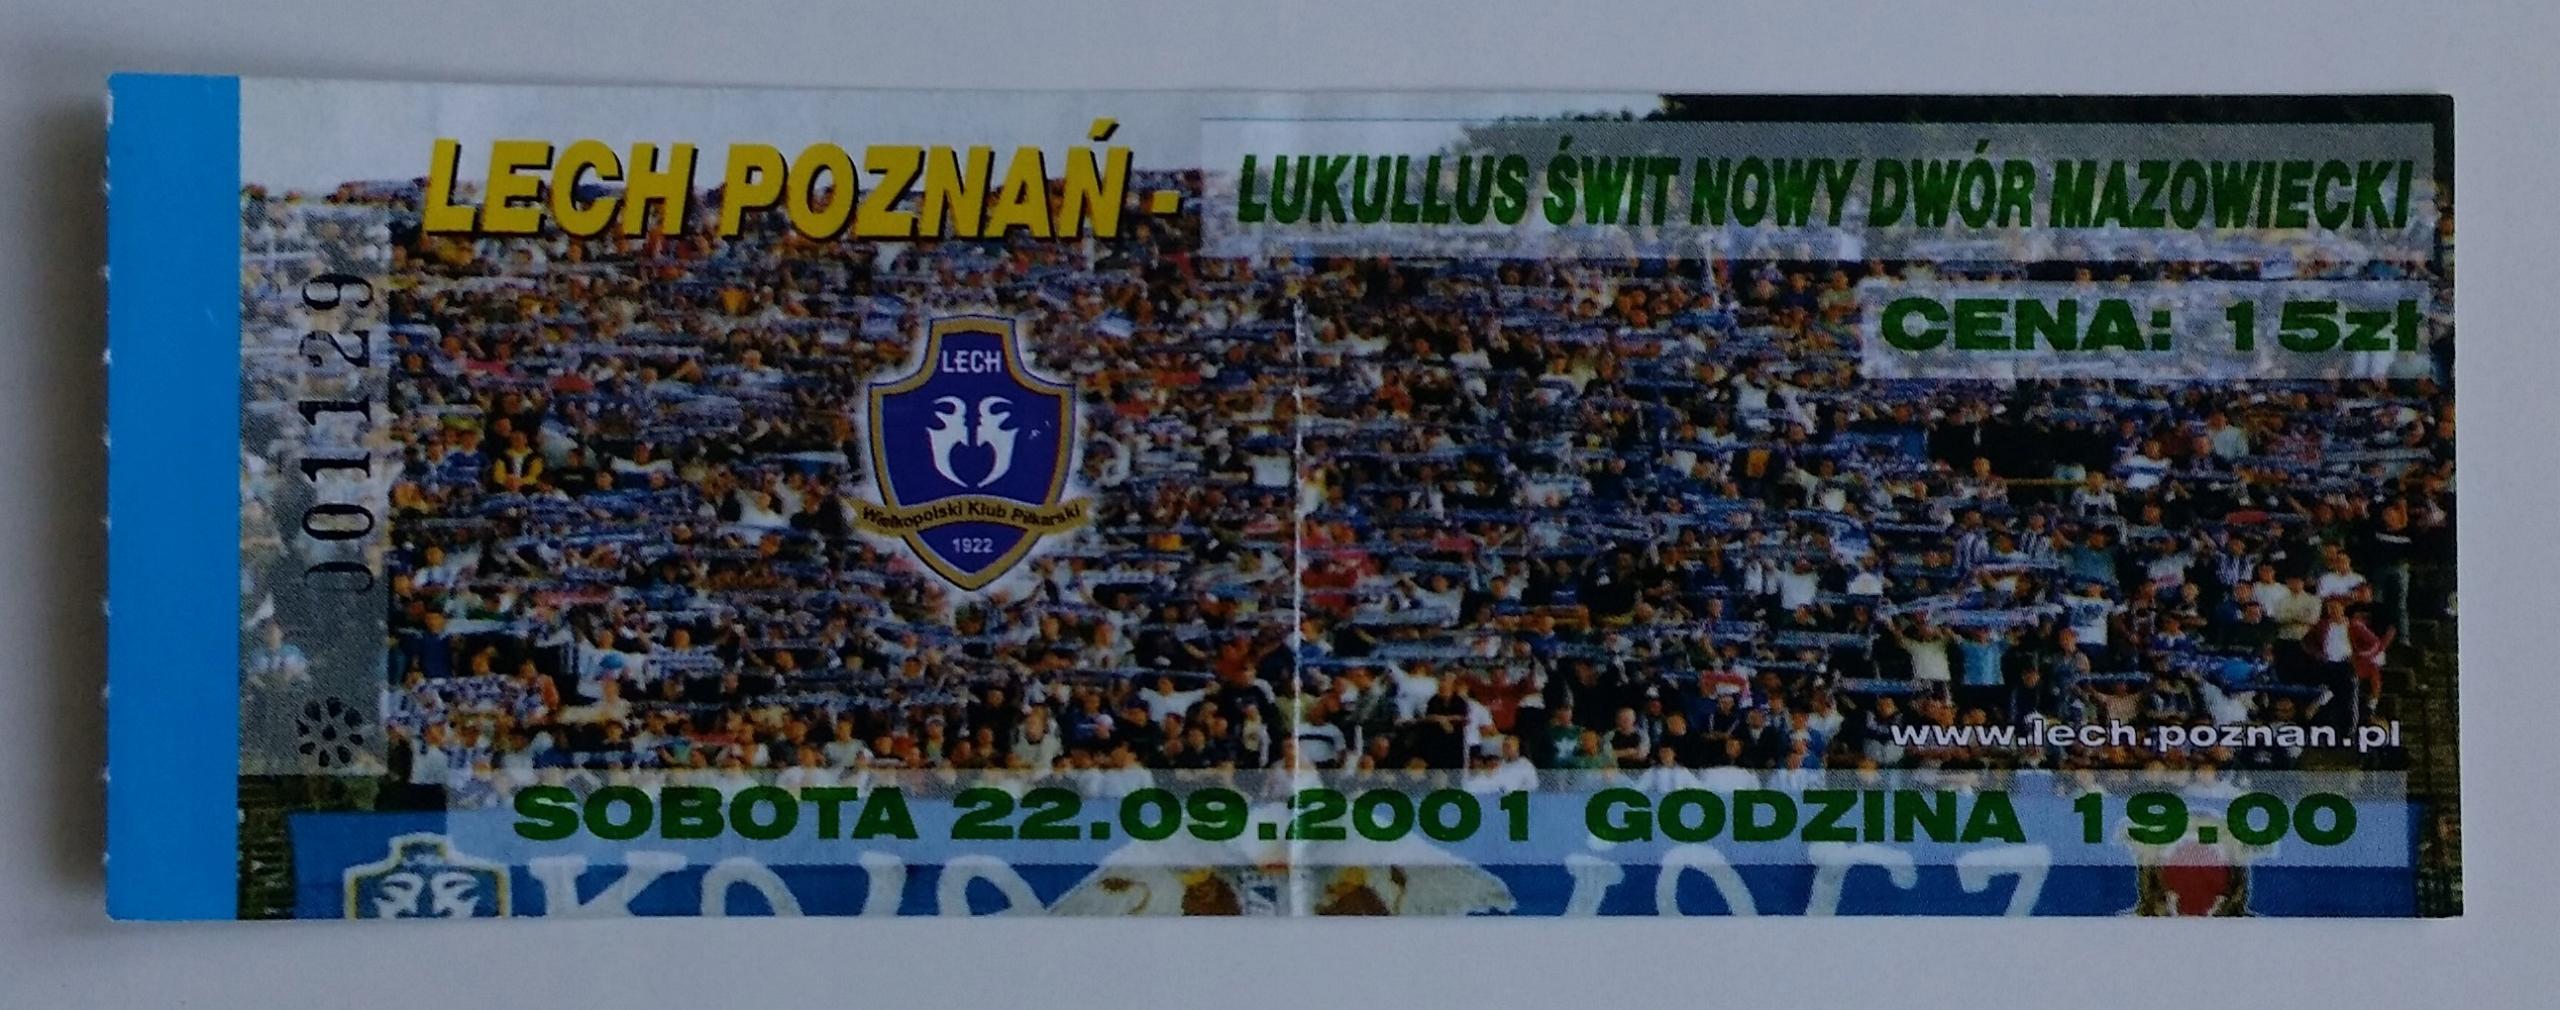 Bilet Lech Poznań - Lukullus Świt 22.09.2001